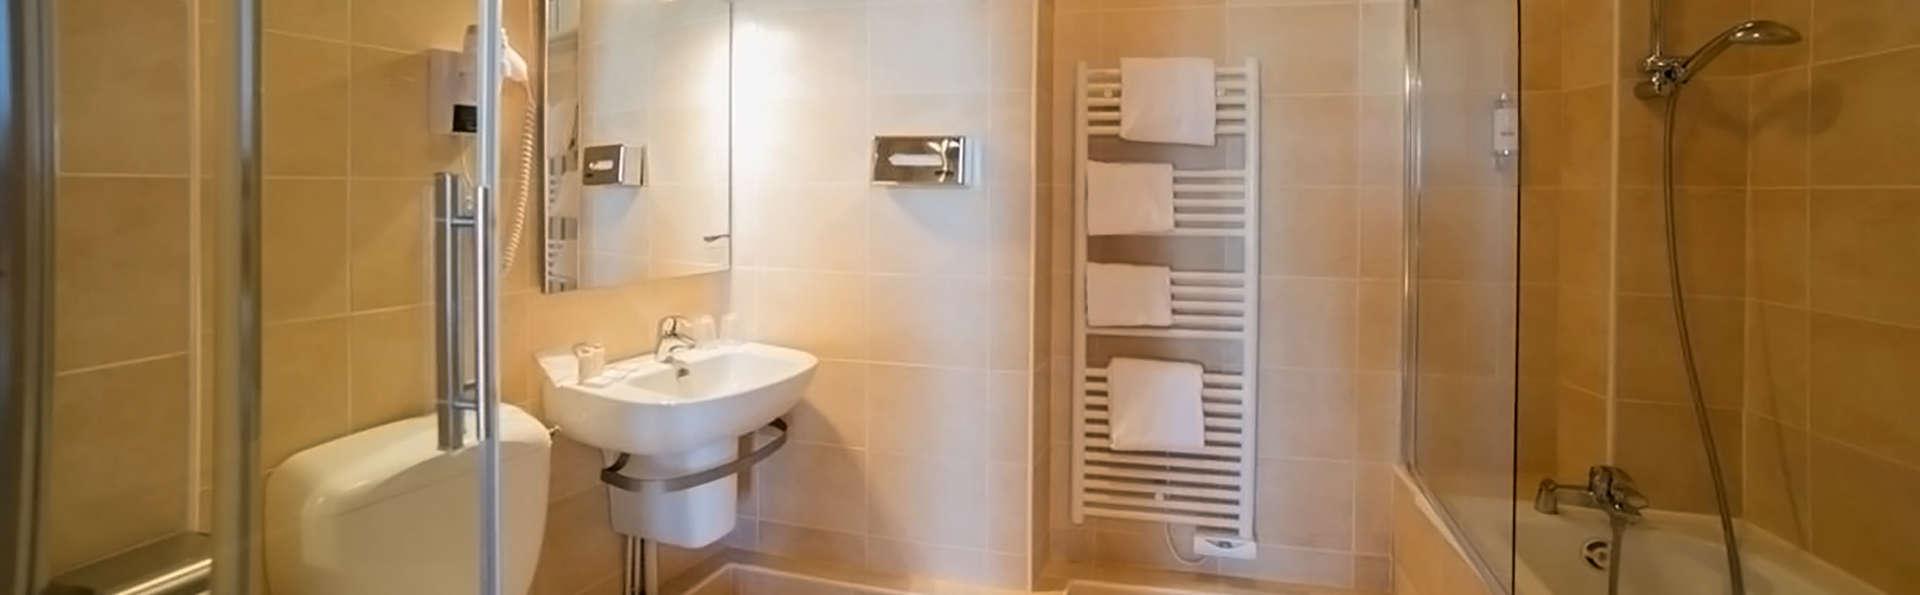 Terrasses Poulard - Edit_Bathroom.jpg